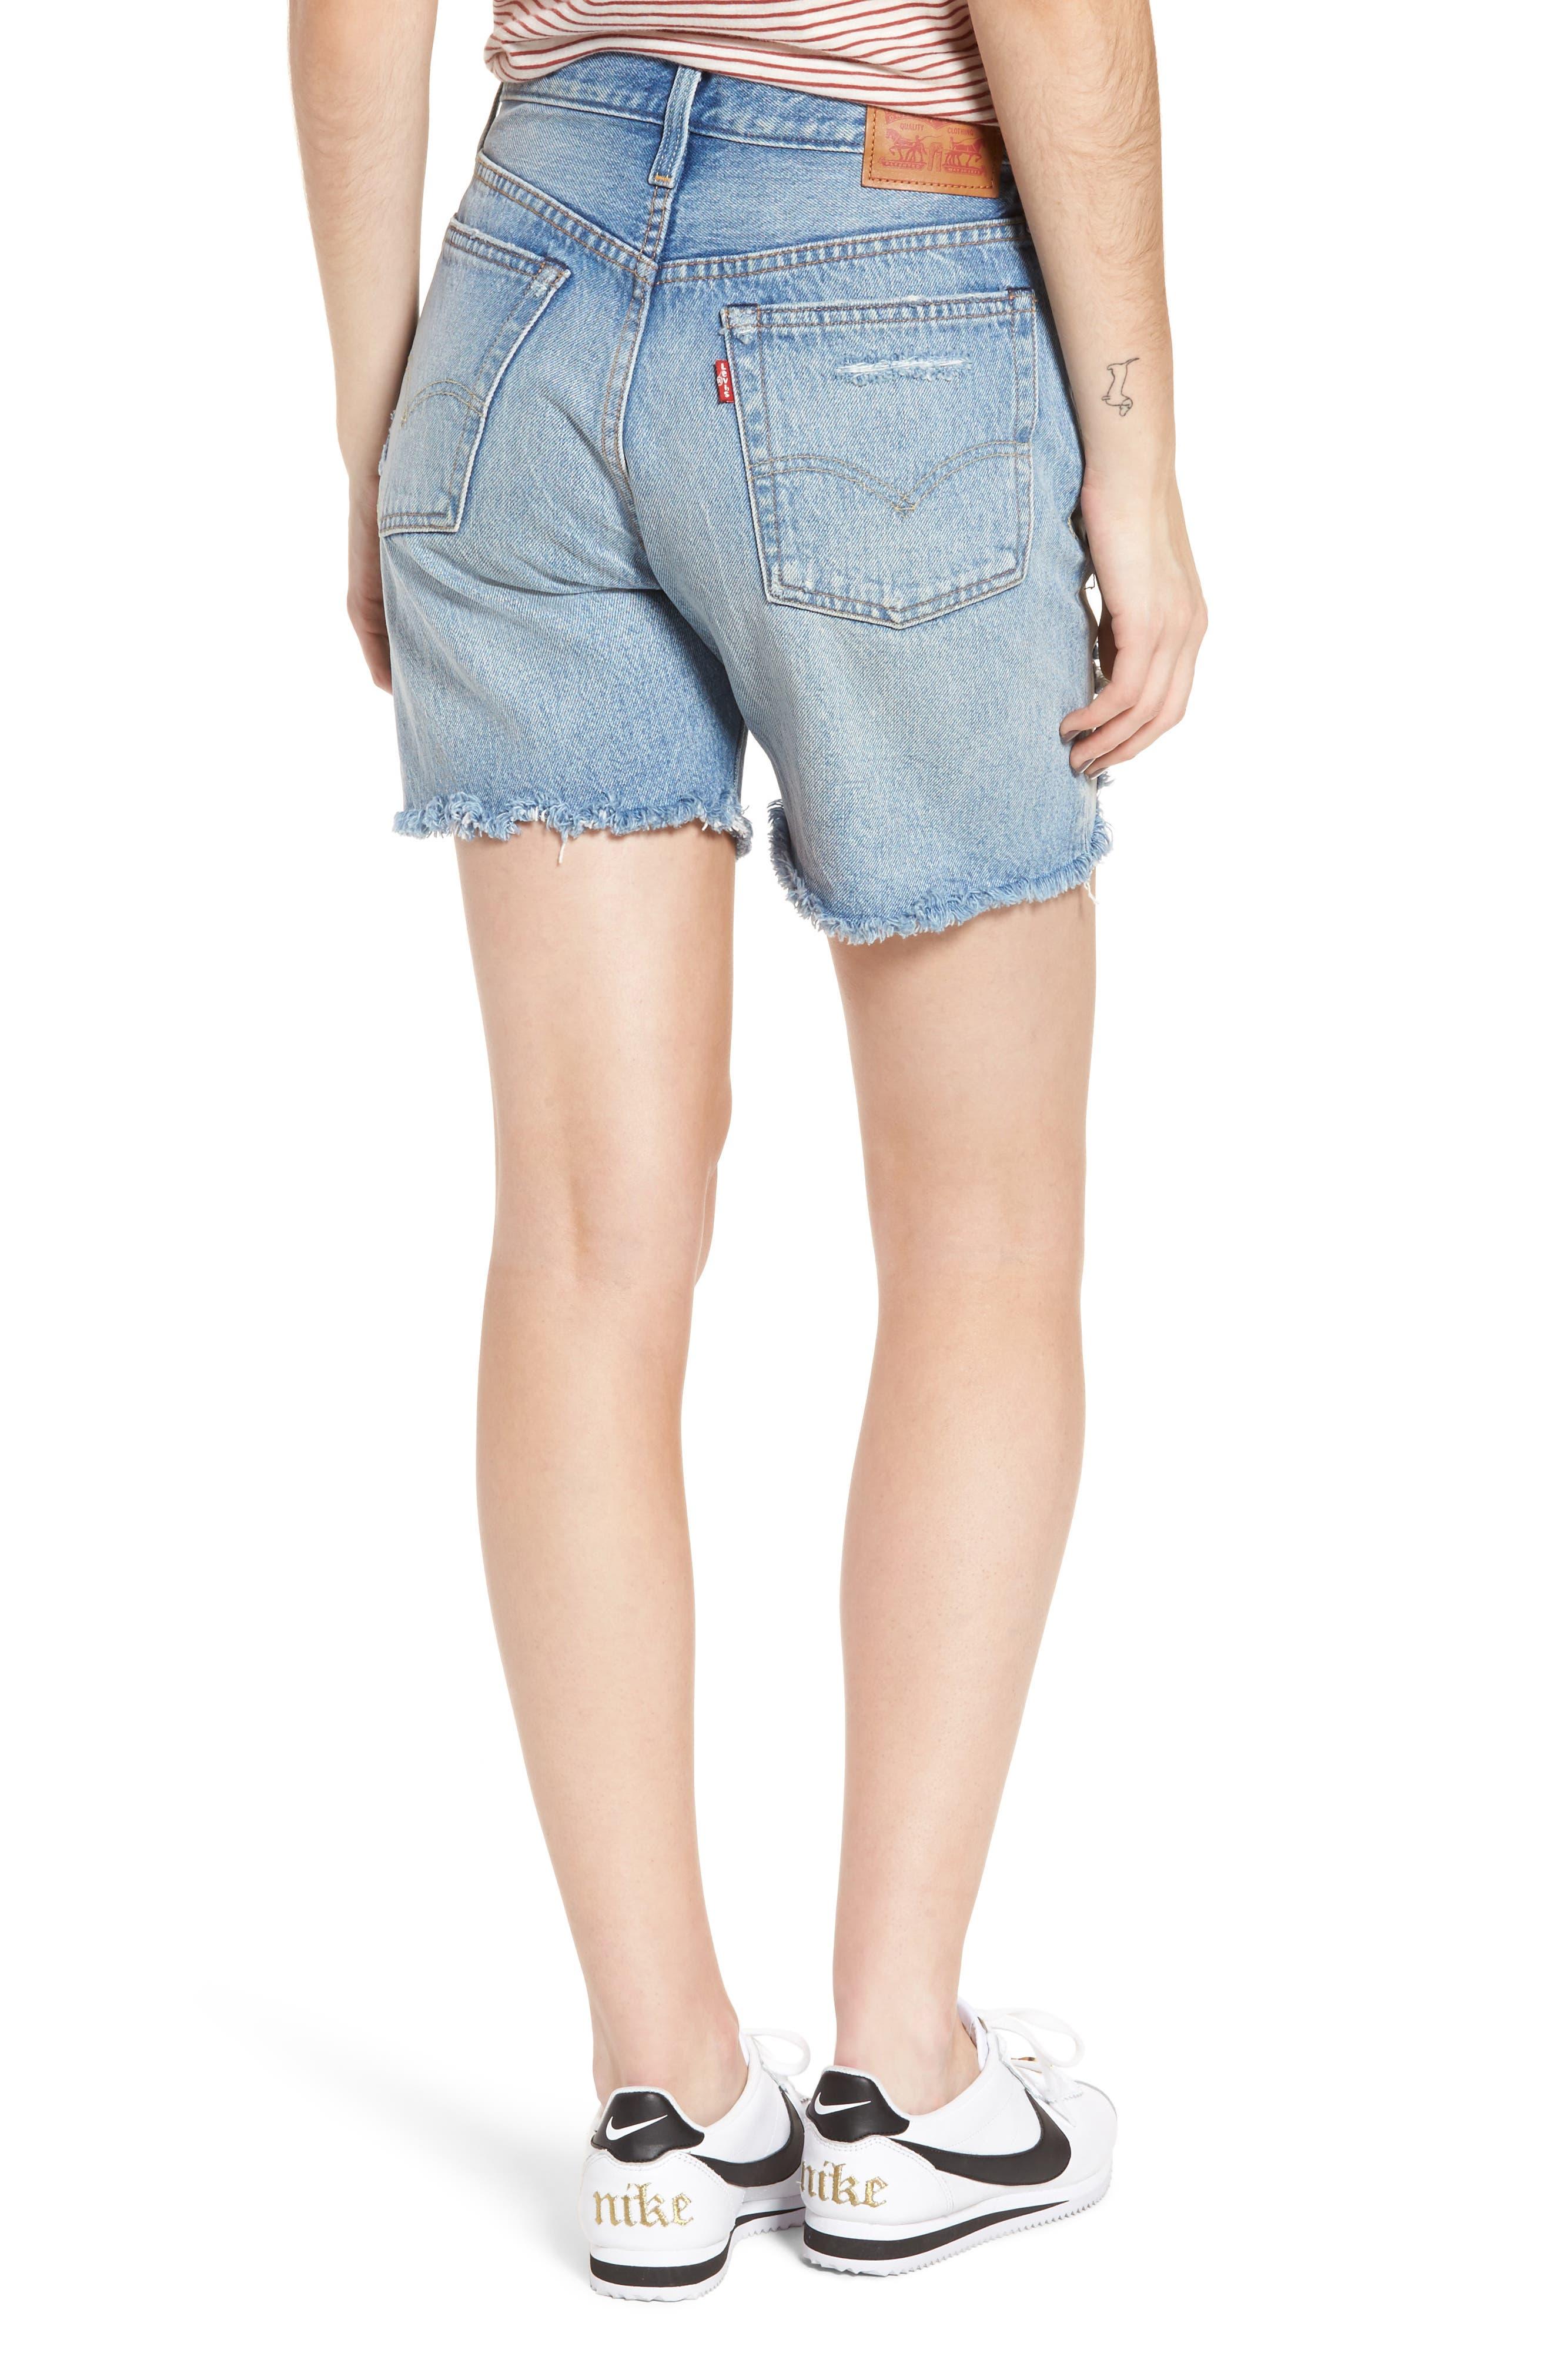 Indie Shredded Cutoff Denim Shorts,                             Alternate thumbnail 2, color,                             450